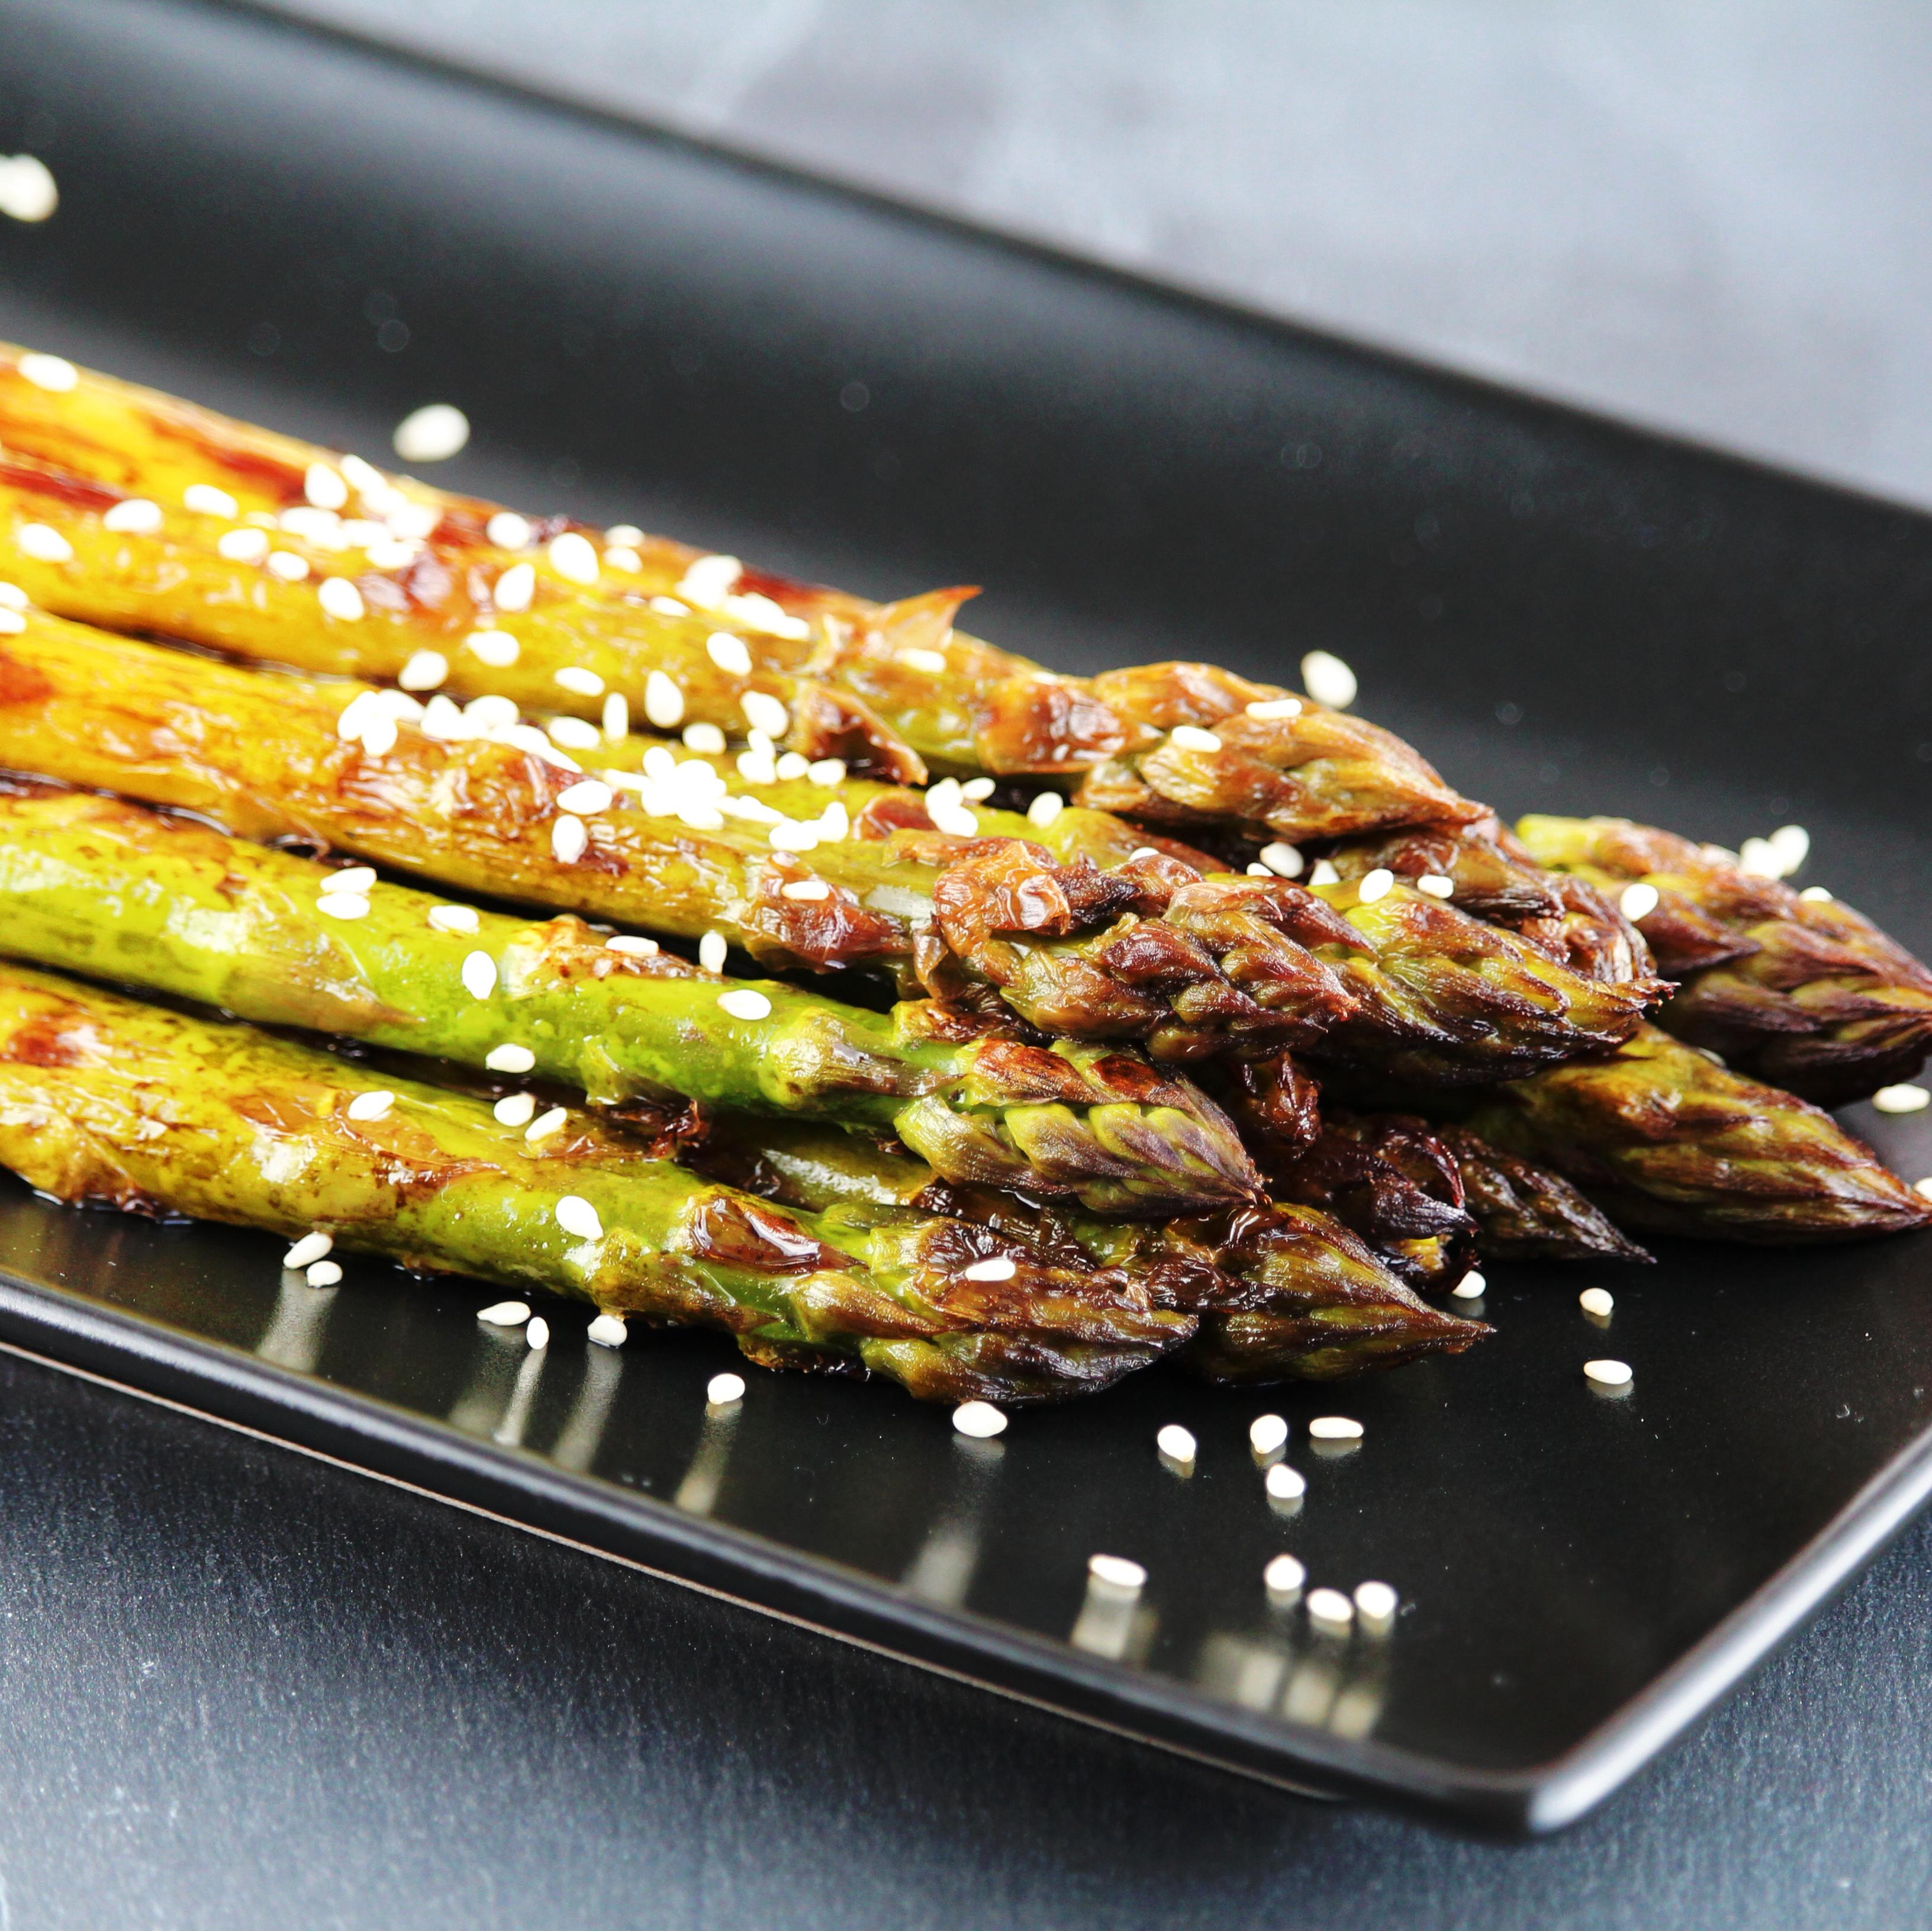 Tasty Barbecued Asparagus